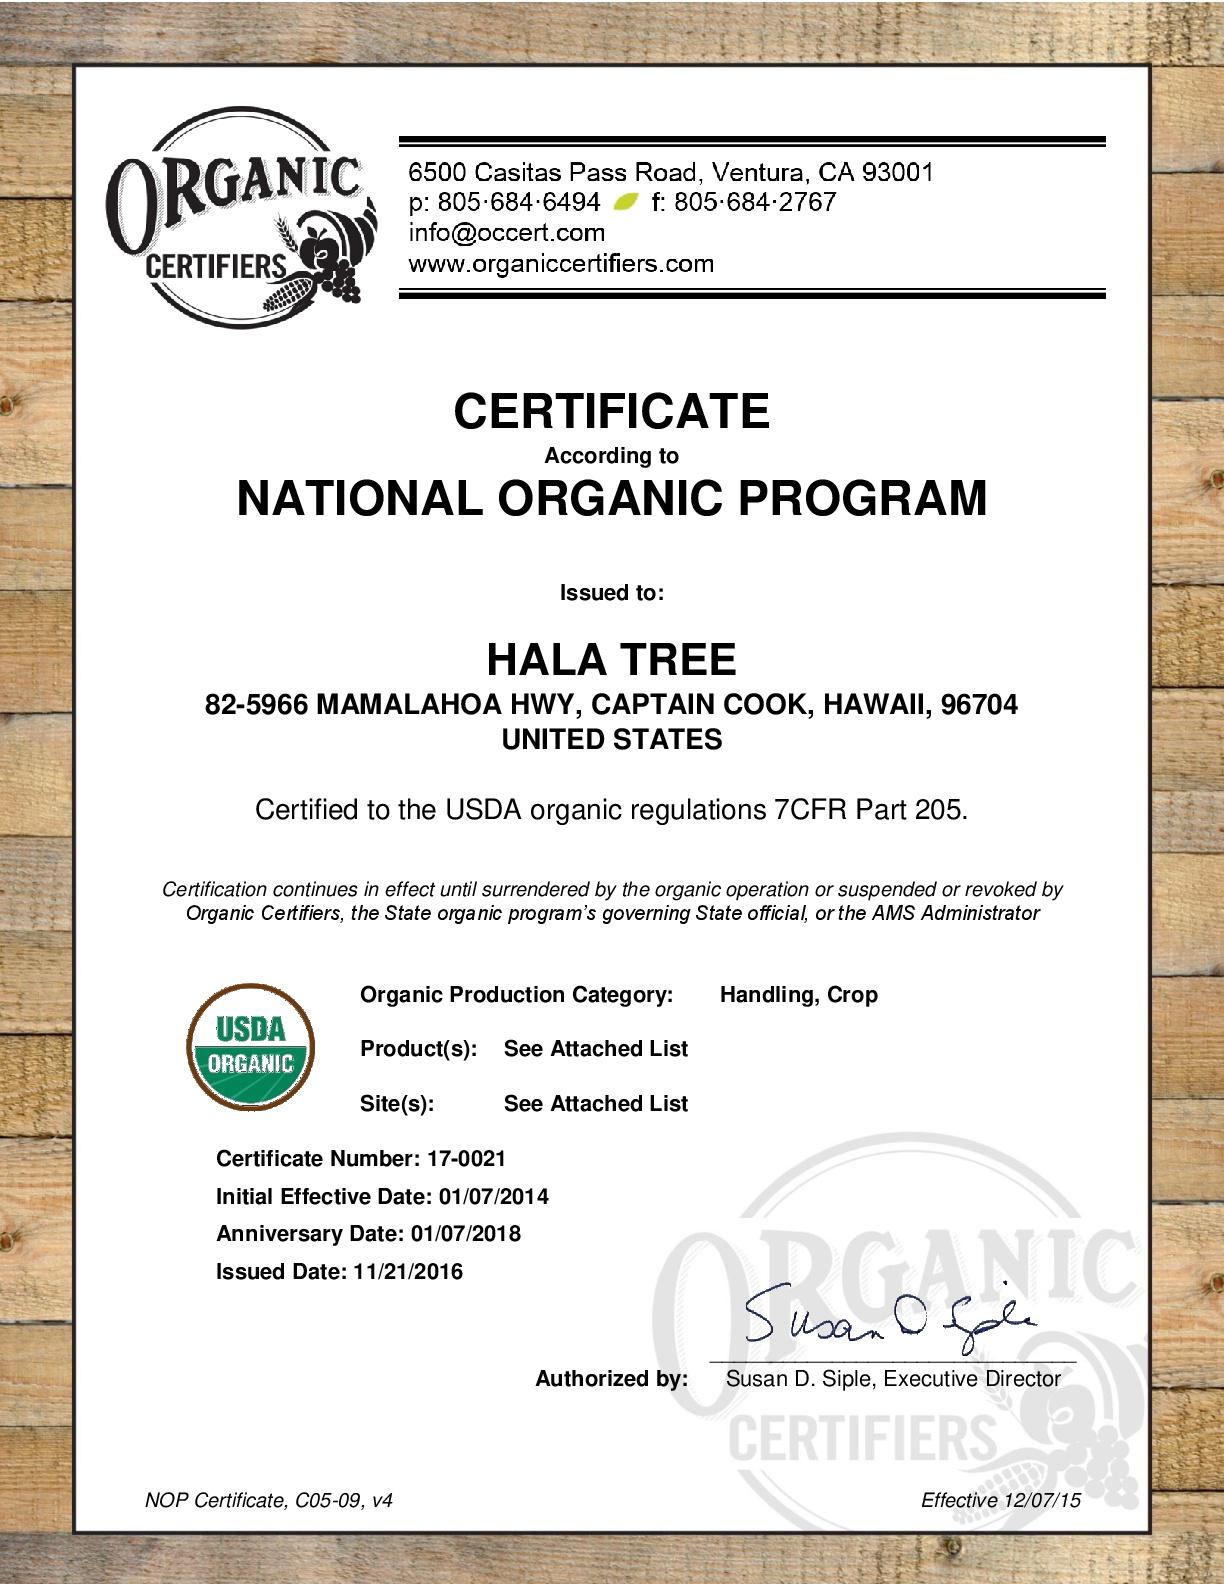 hala-tree-17-0021-certificate-of-organic-production-nop-001-1-.jpg